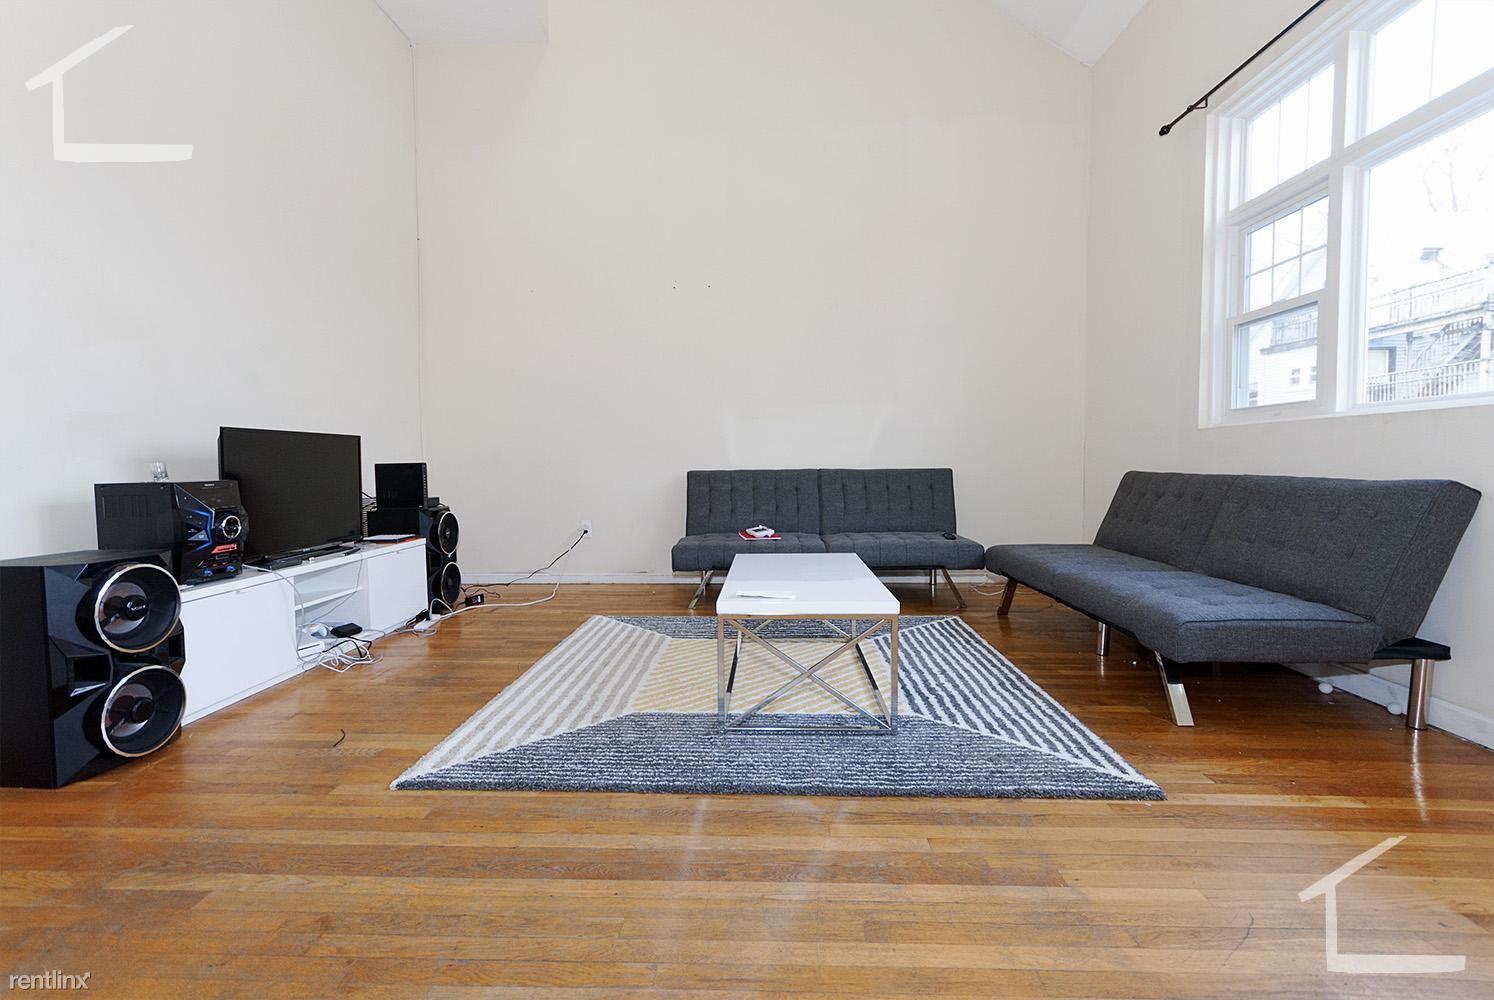 127 Glenville Ave, Allston, MA - $4,550 USD/ month